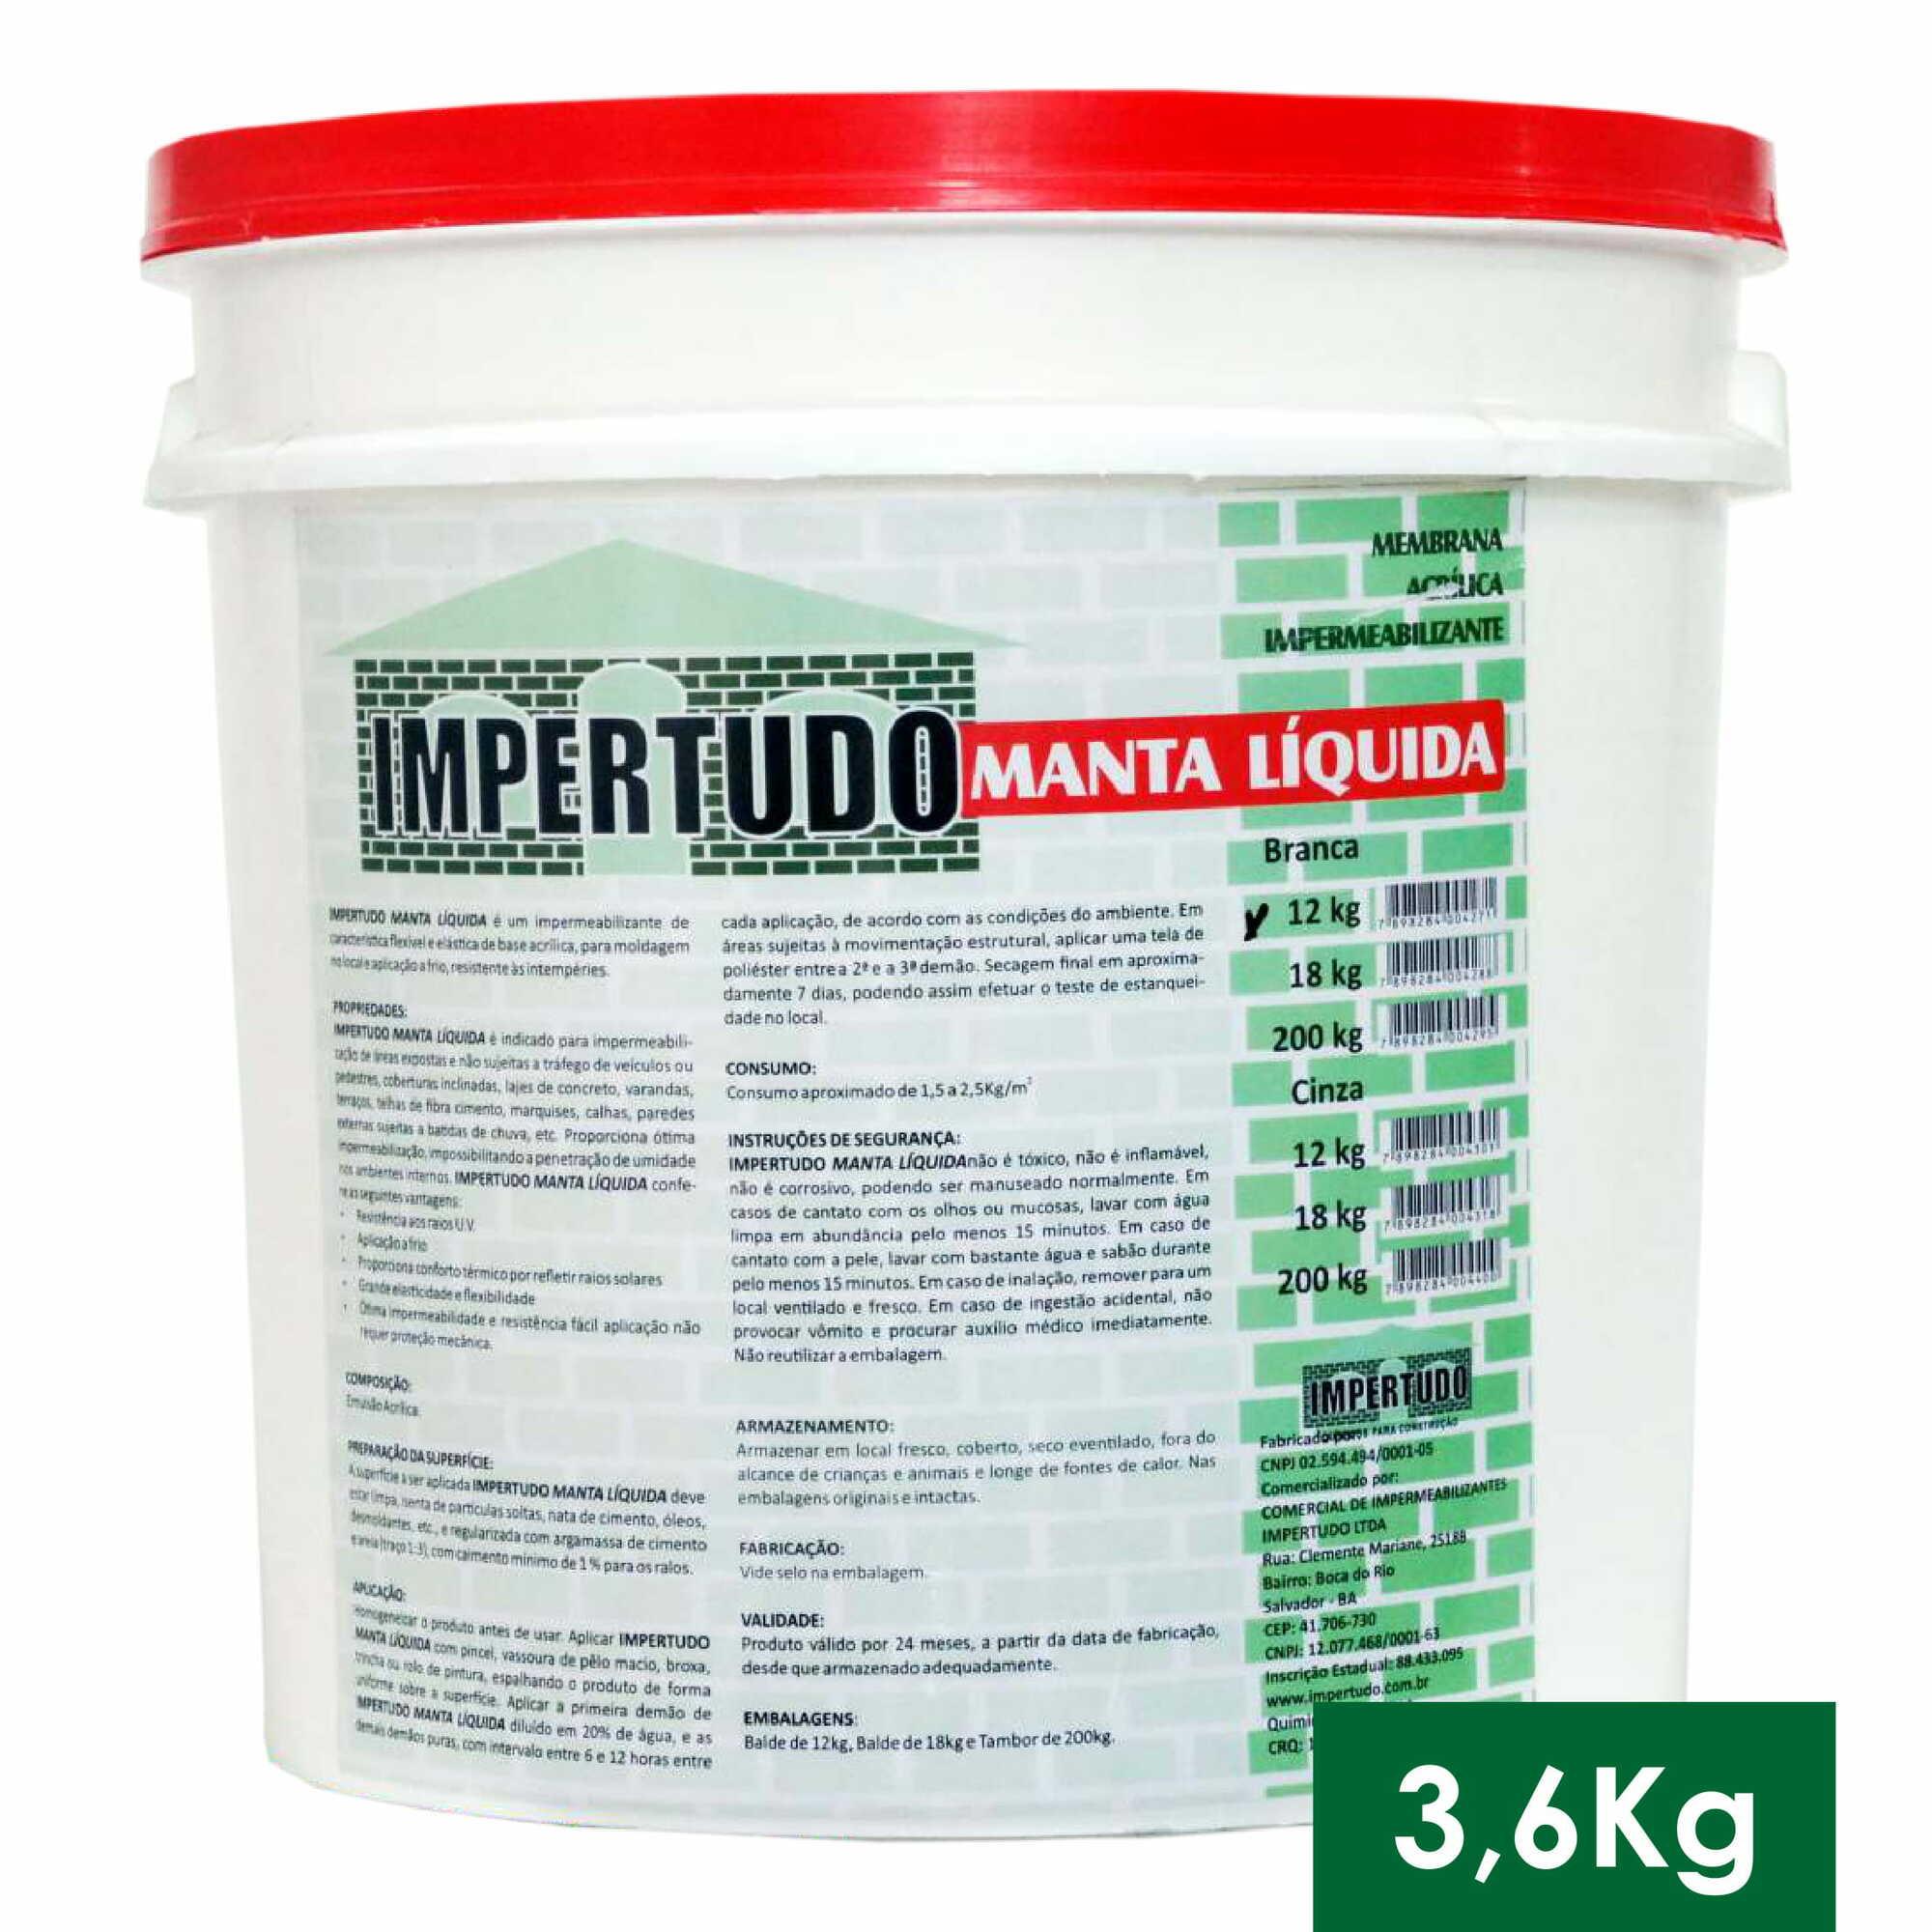 IMPERTUDO MANTA LIQUIDA BRANCA - GALAO 3,6 KG